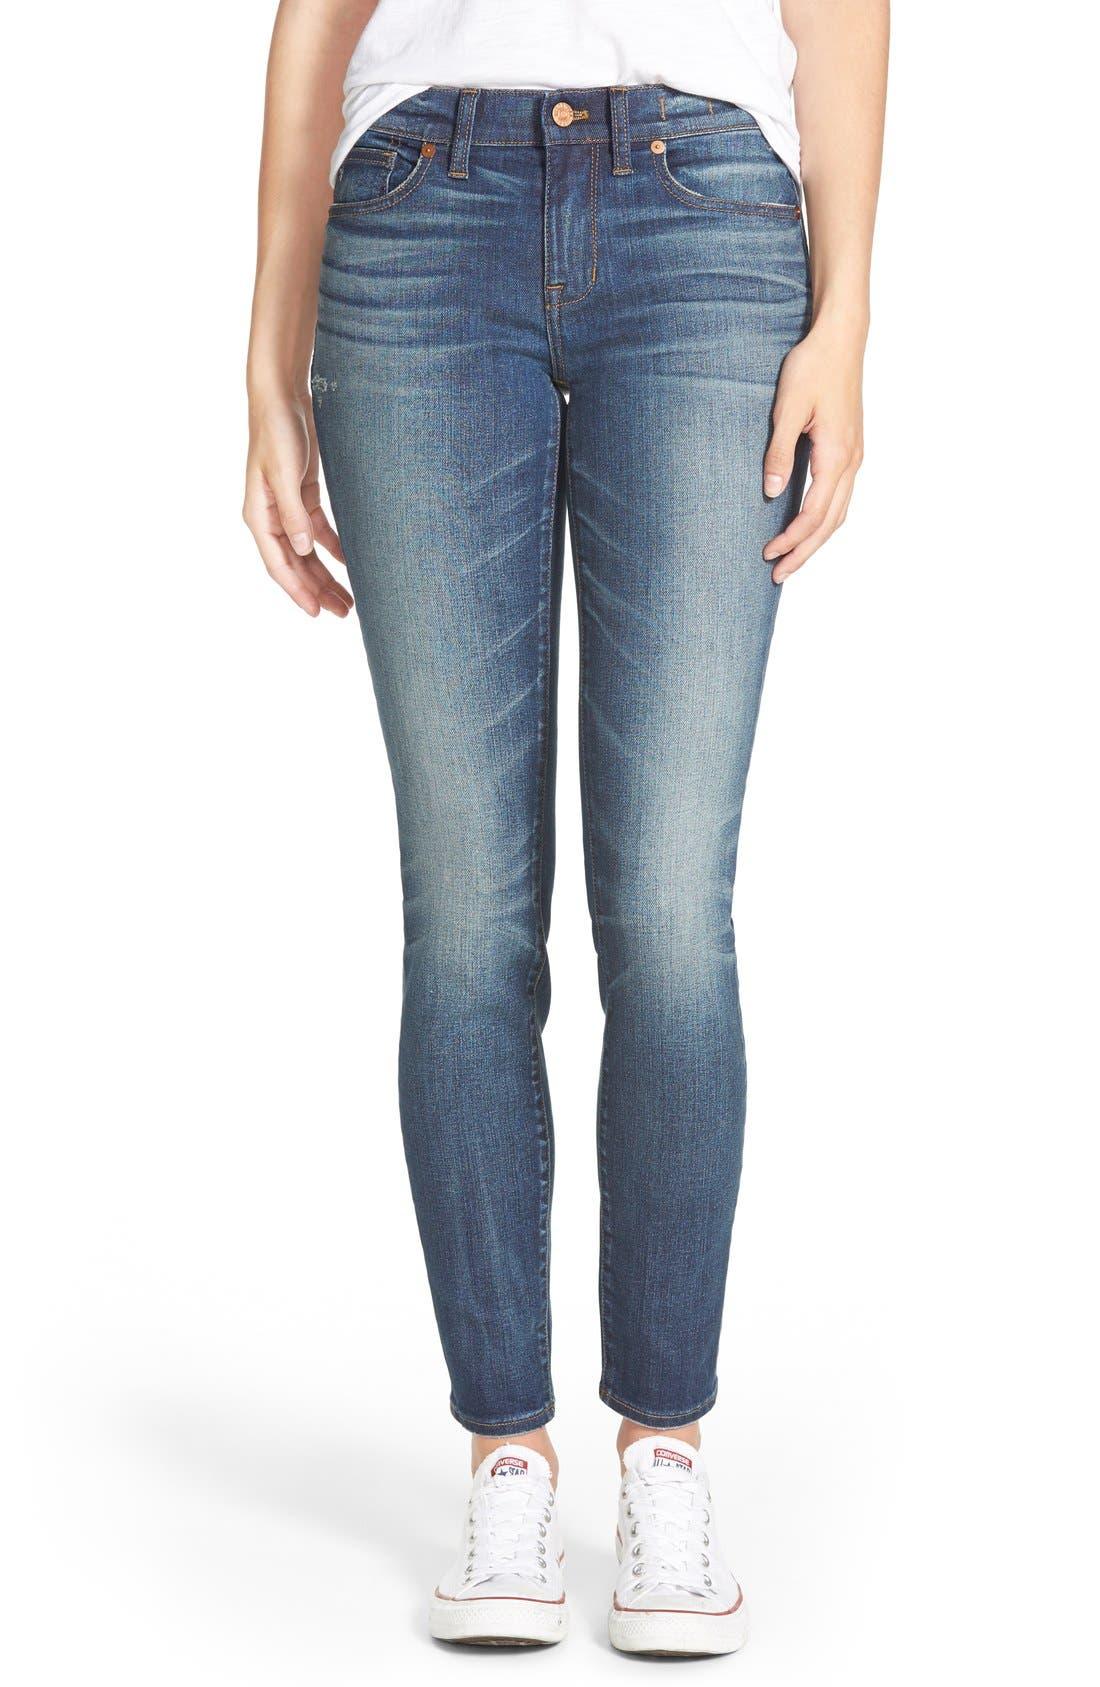 Alternate Image 1 Selected - Madewell 'Skinny Skinny - Taller' Jeans (Edmonton Wash) (Long)